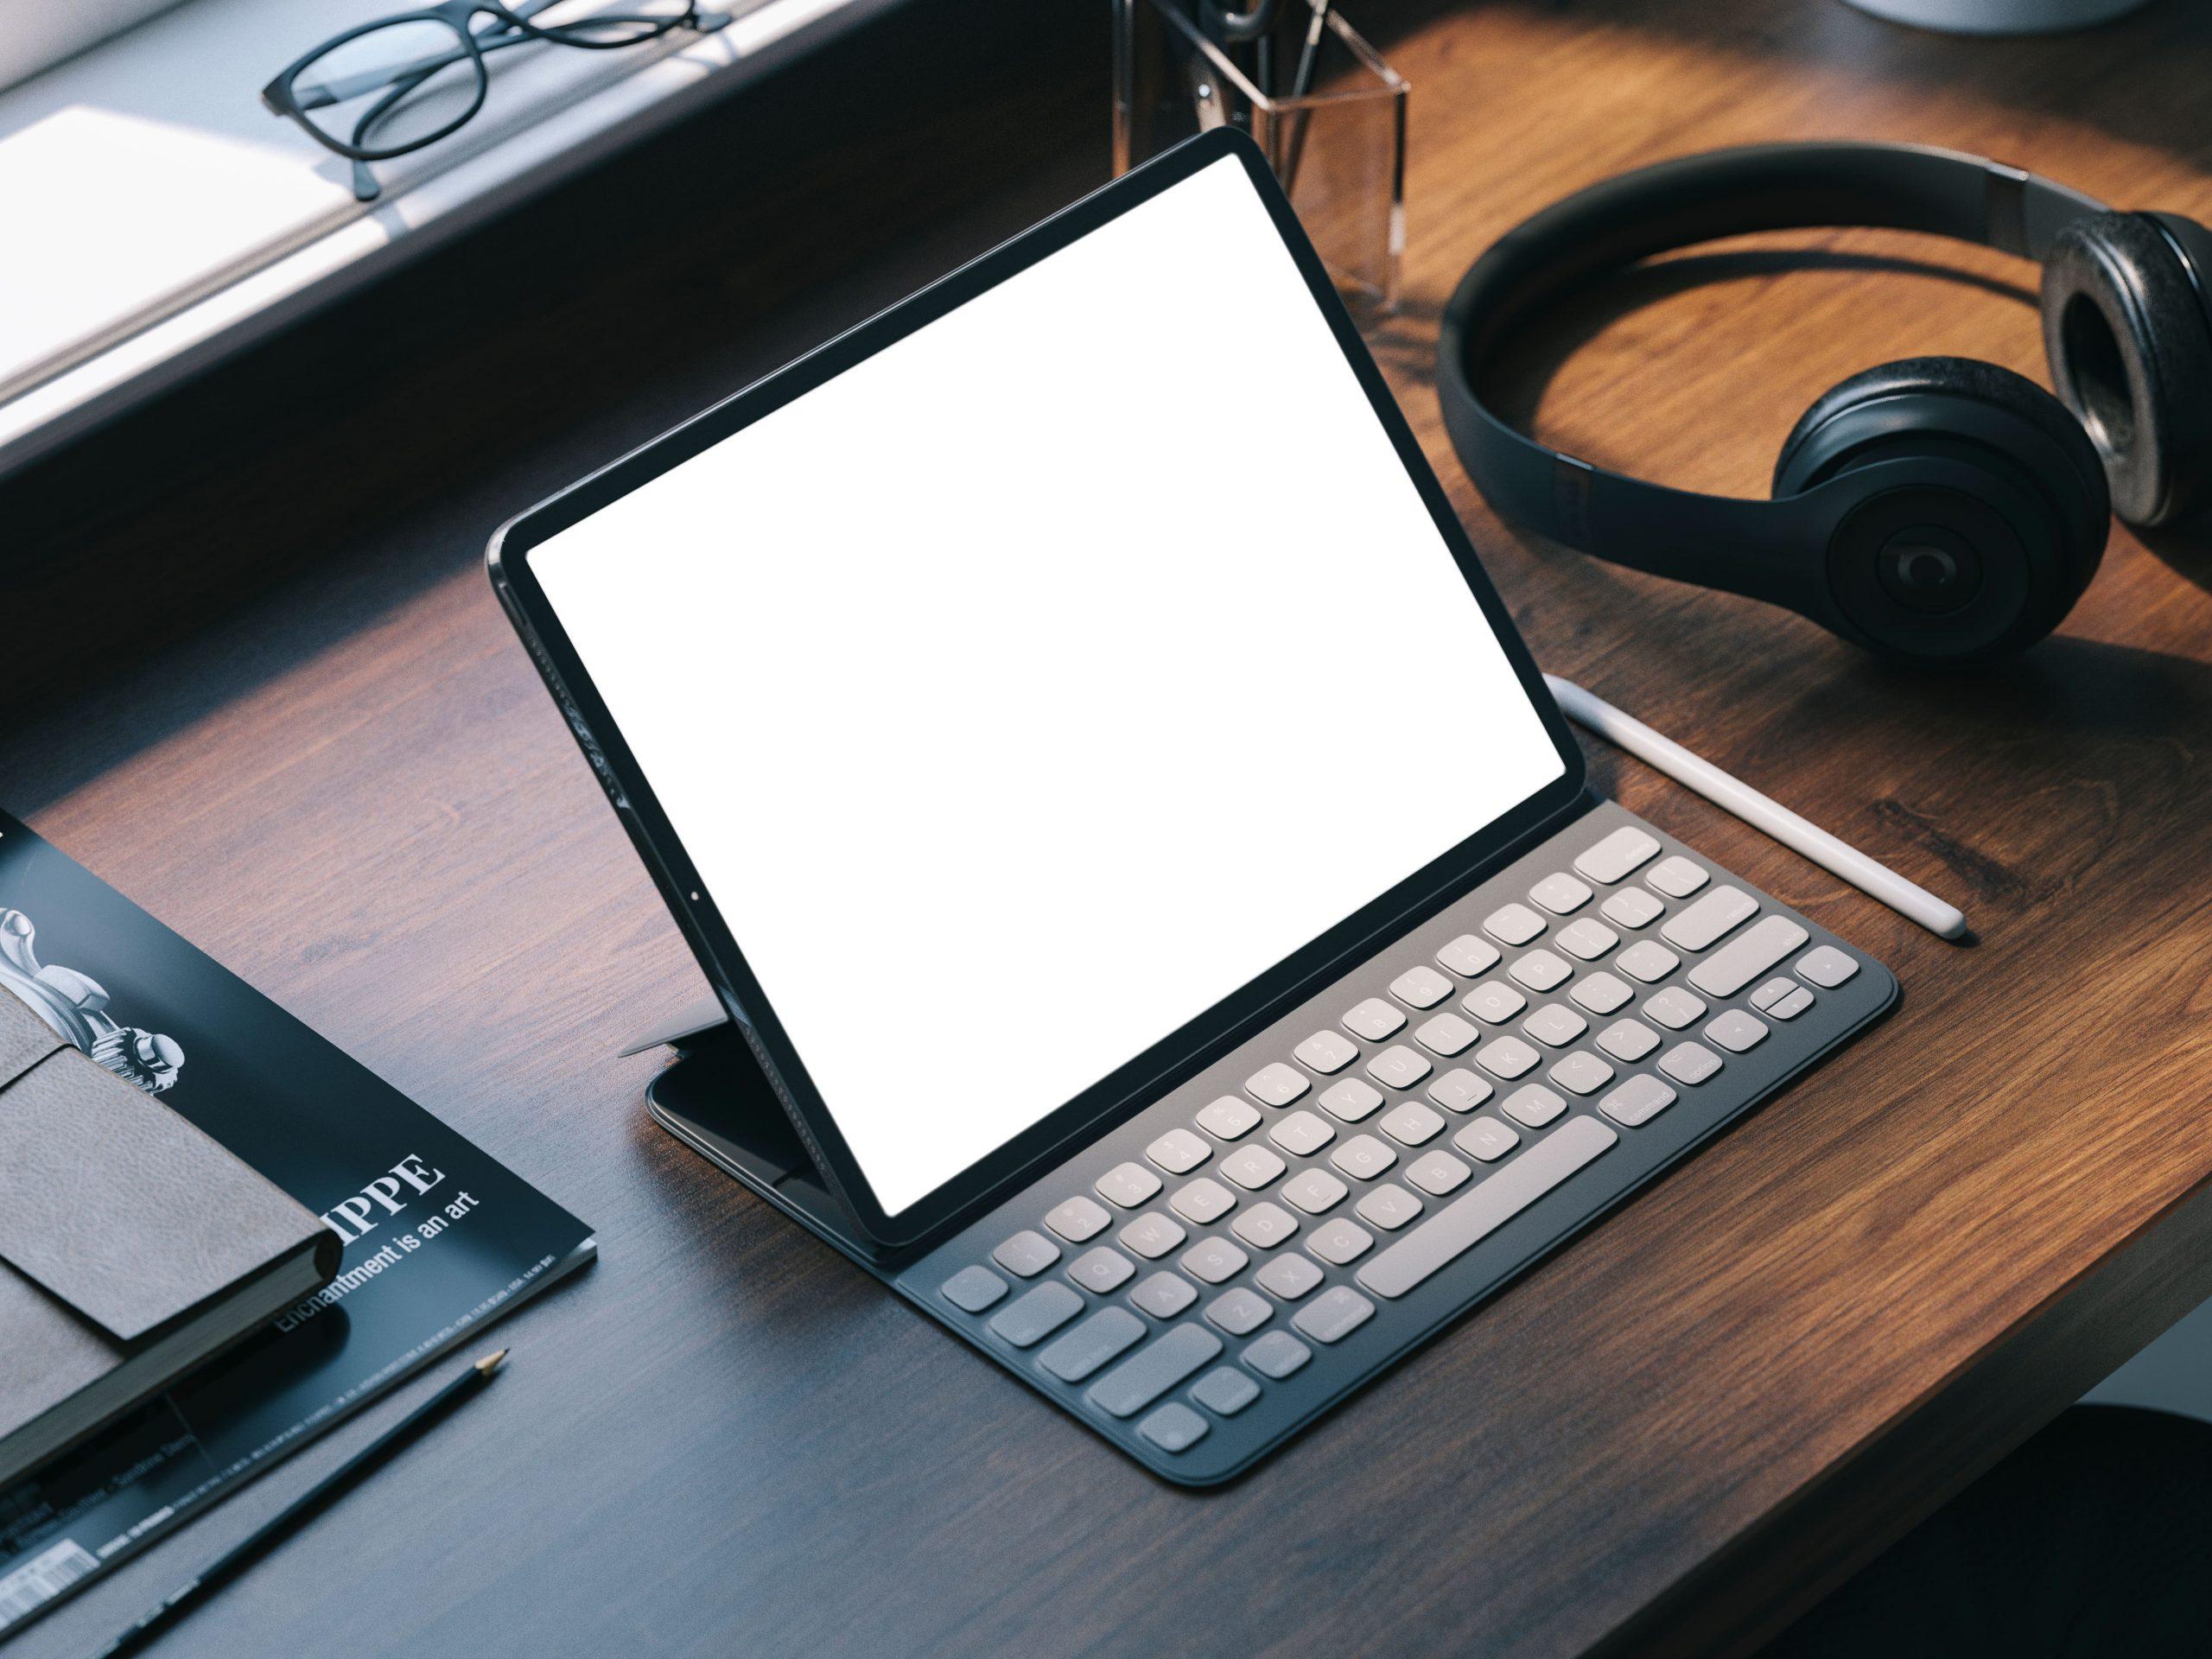 iPadケースの紹介動画制作の依頼